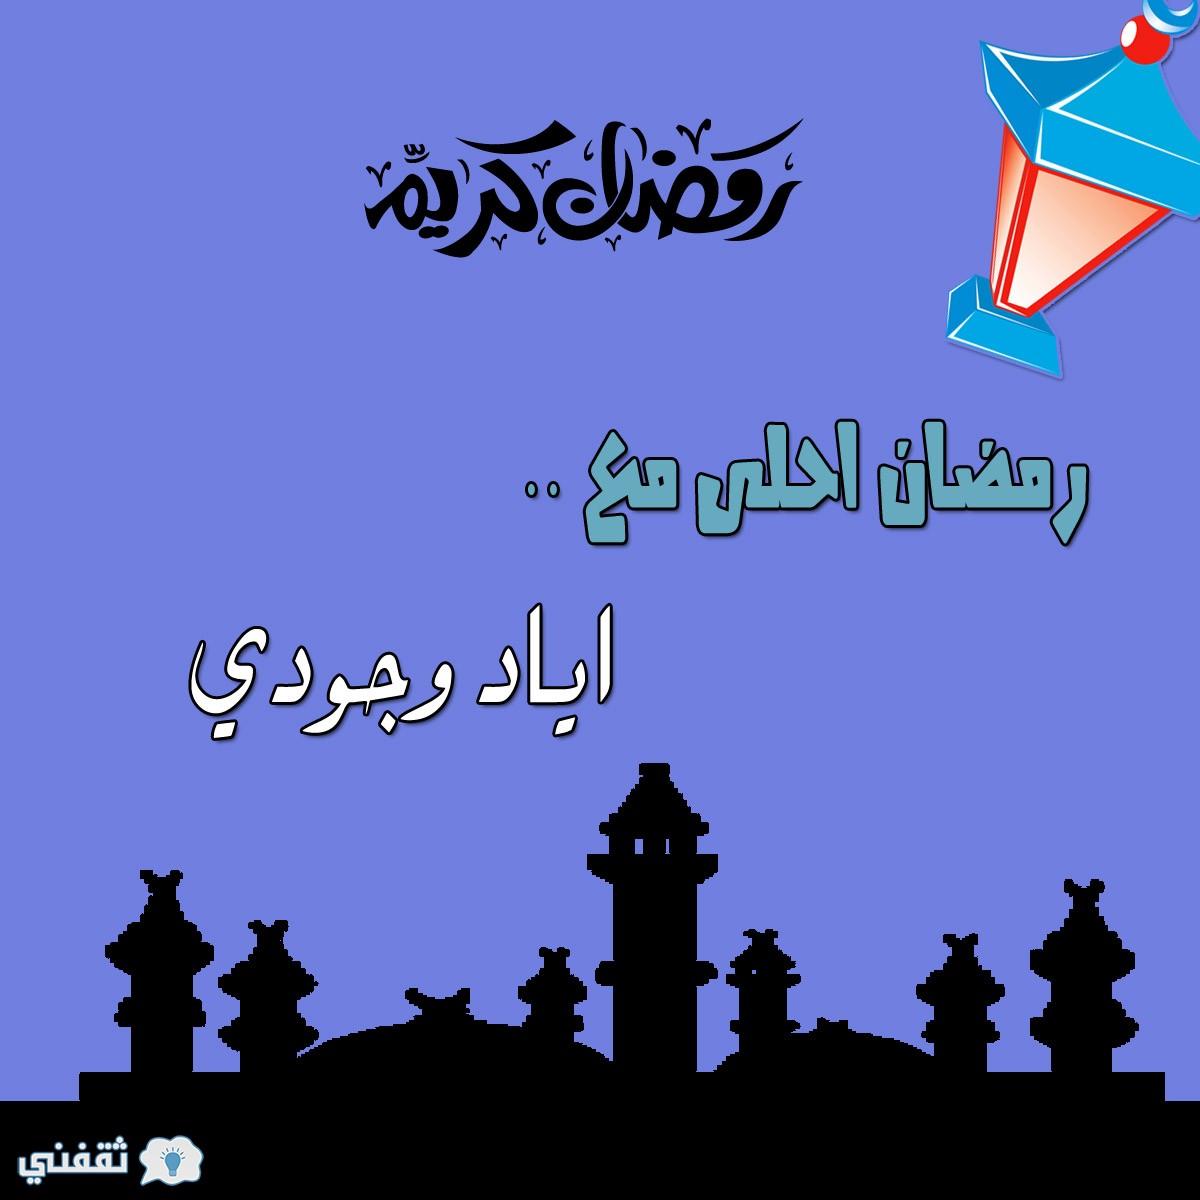 رمضان احلى مع اياد وجودي